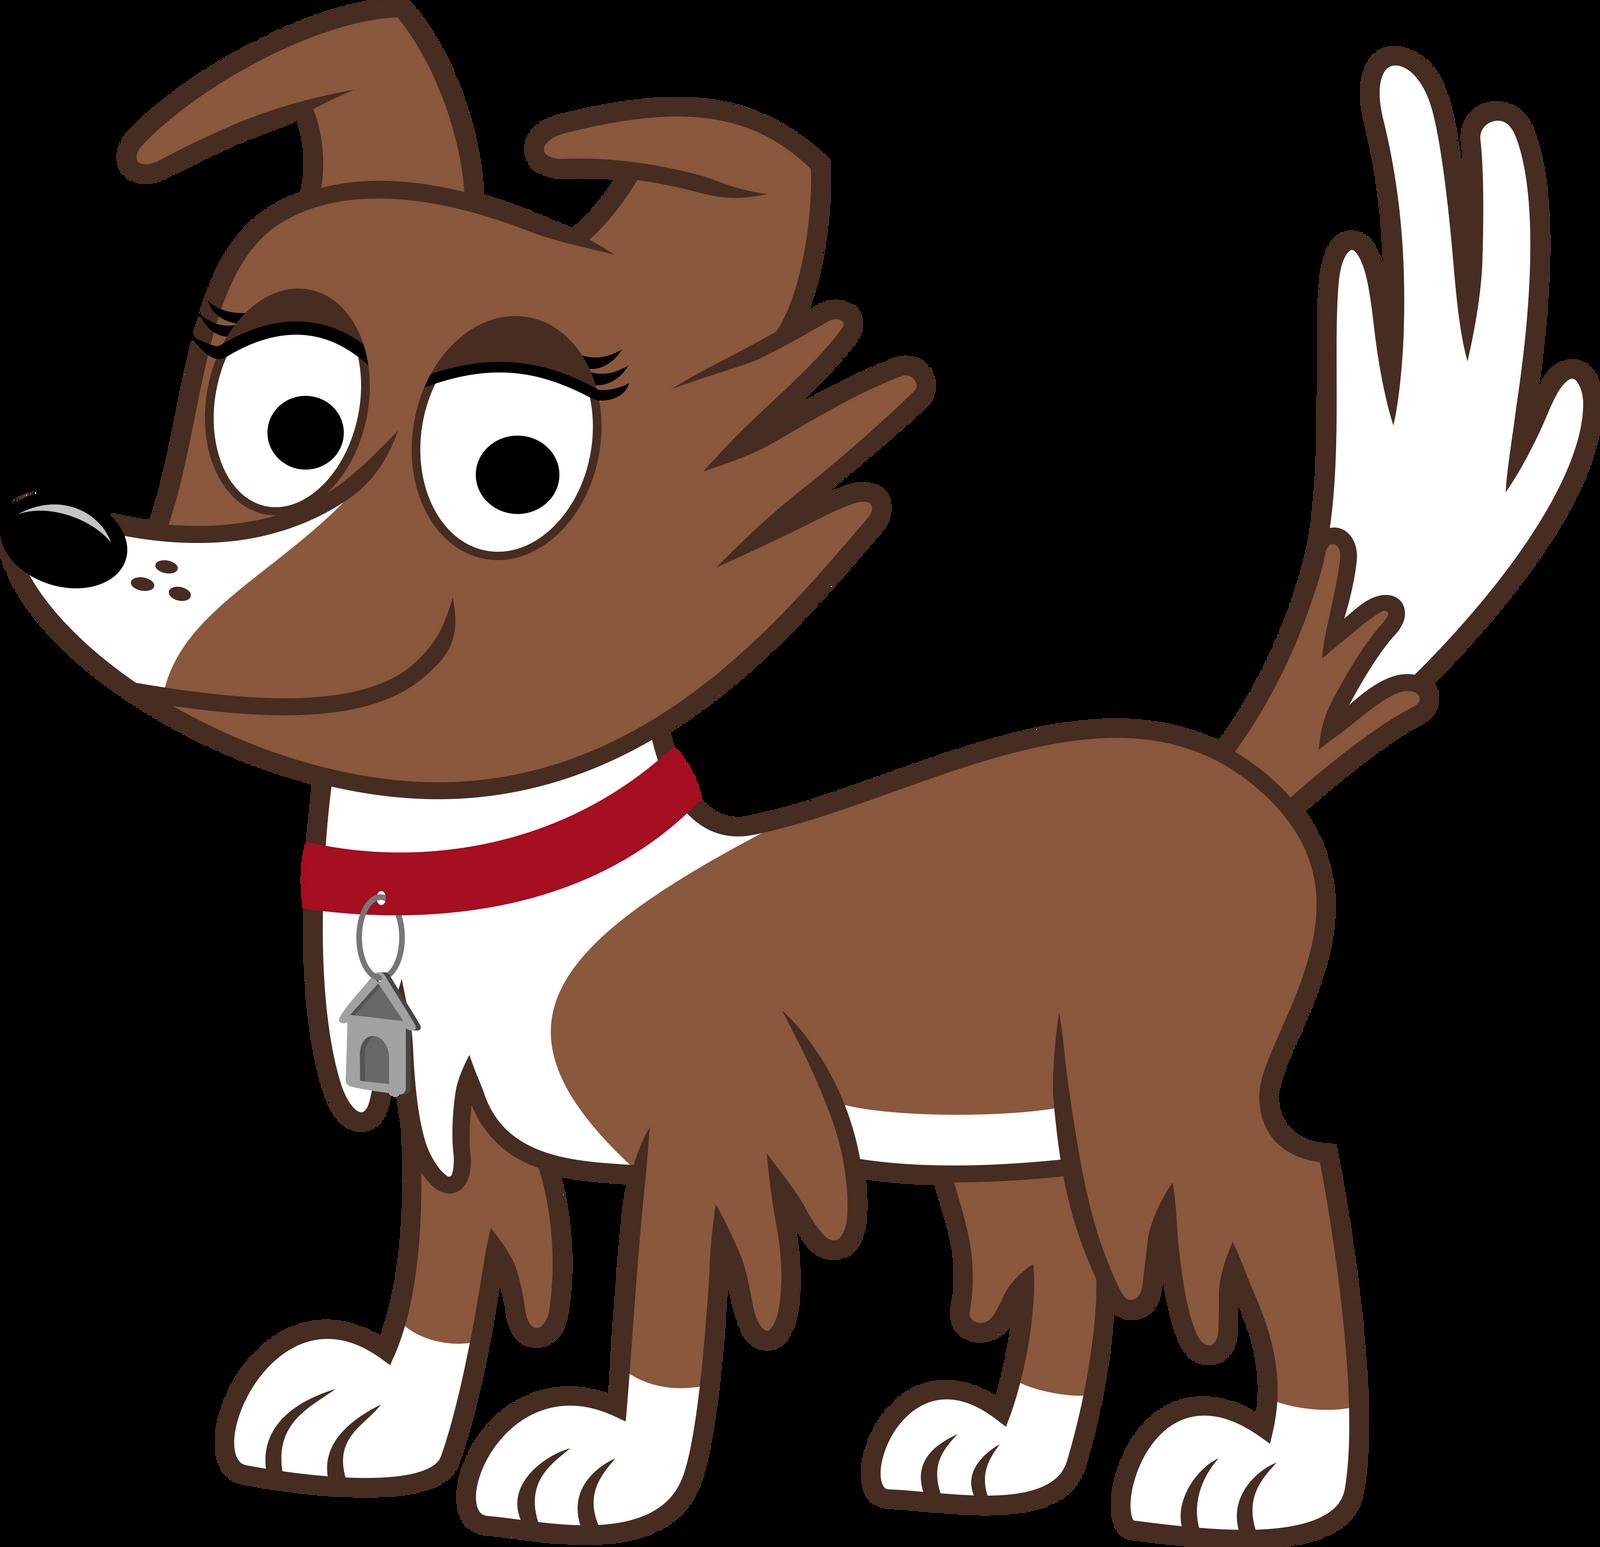 Cartoon Dog Giving The Finger